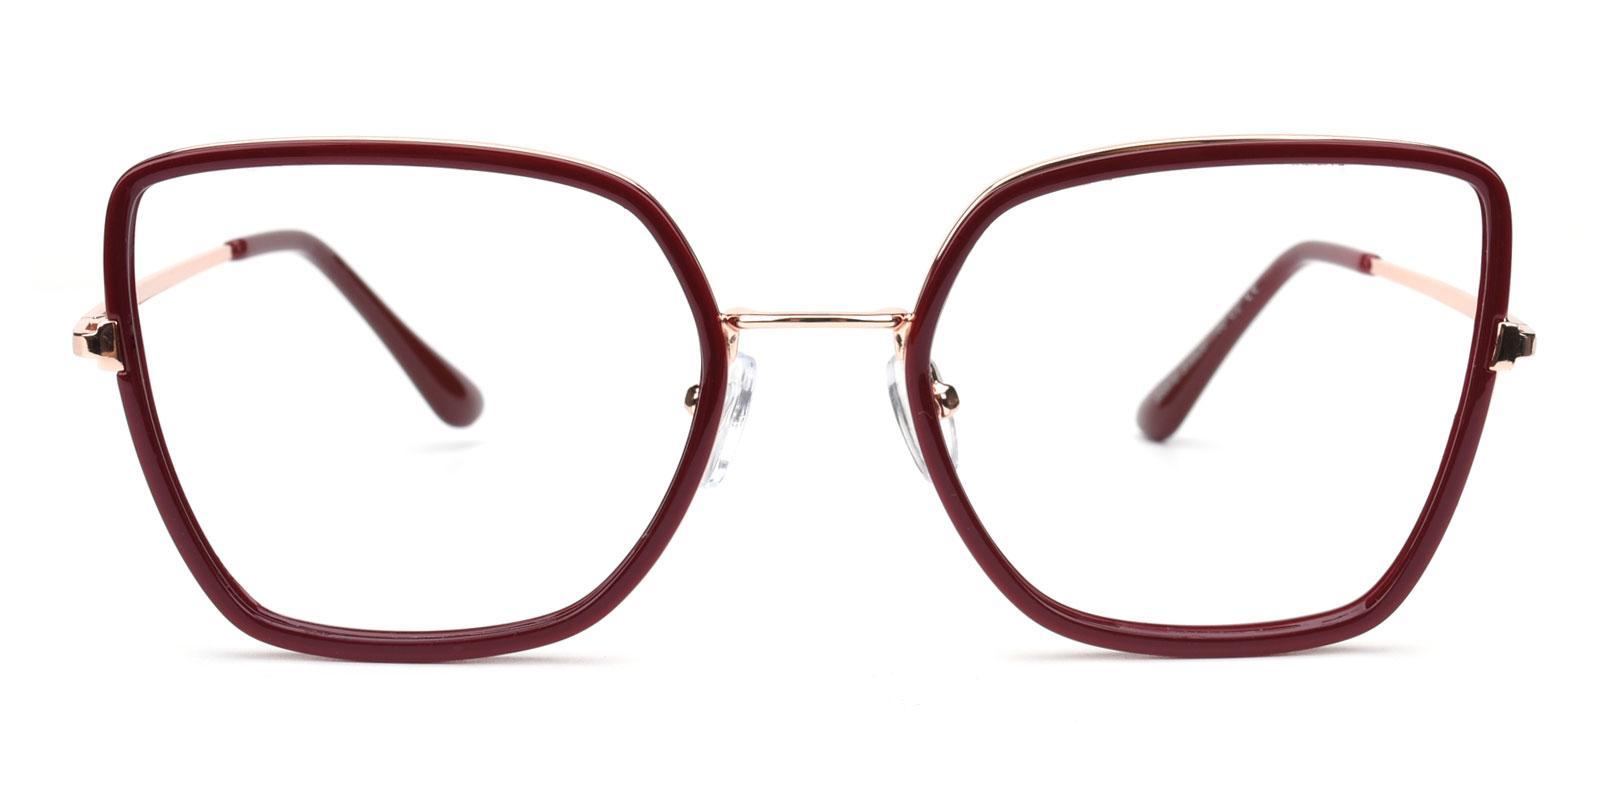 Fay-Red-Geometric-Combination-Eyeglasses-detail